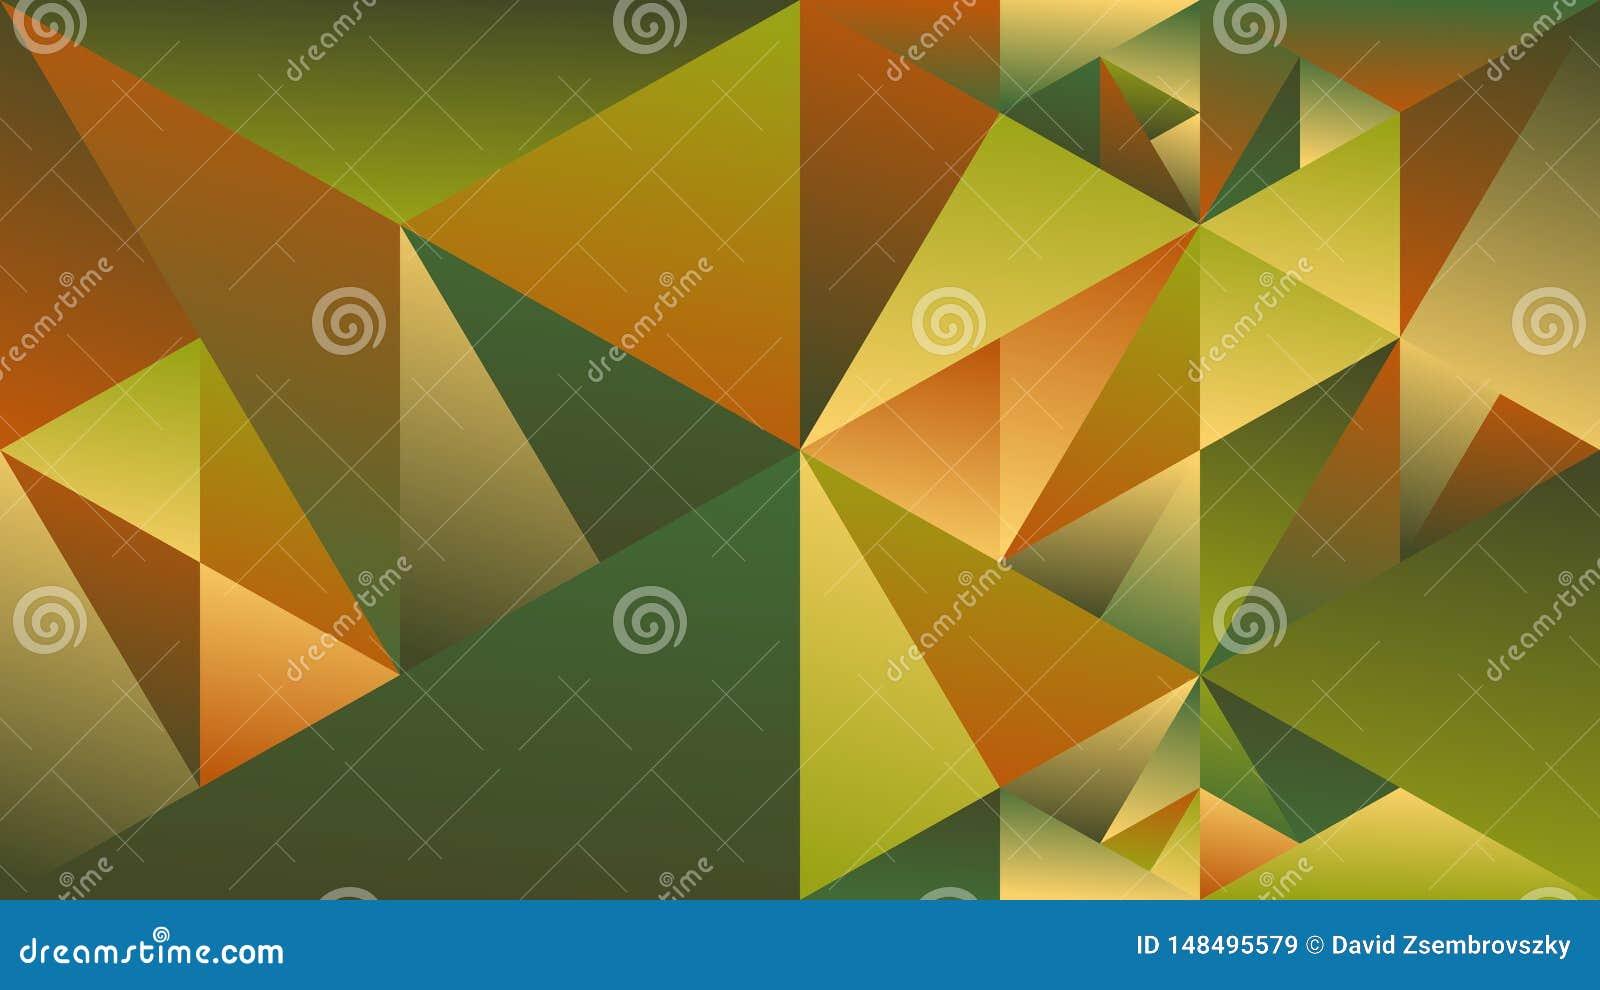 Minimal Polygonal Dynamic Multicolored Gradient Triangle Hd